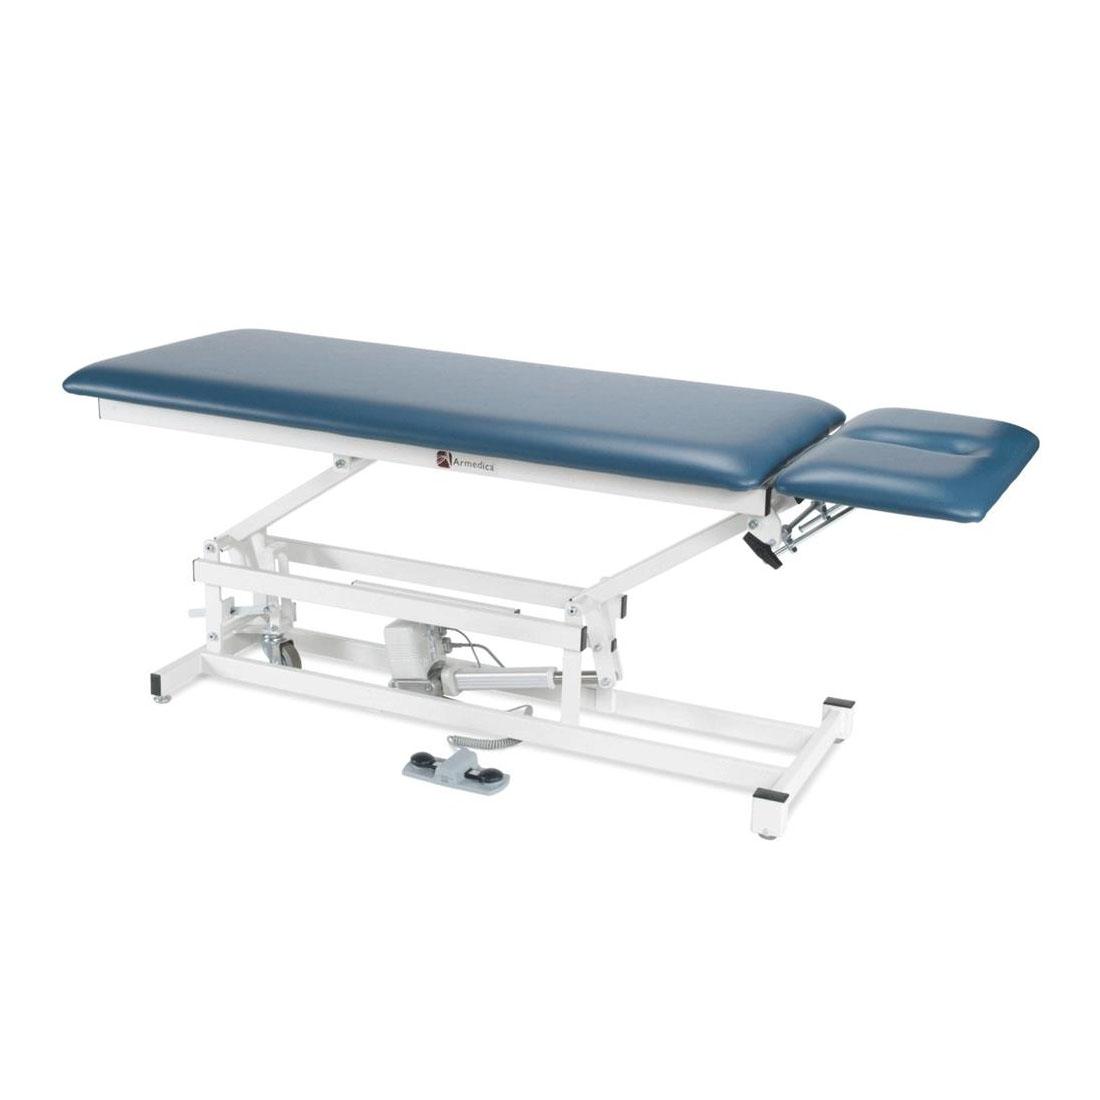 Armedica AM-200 treatment table